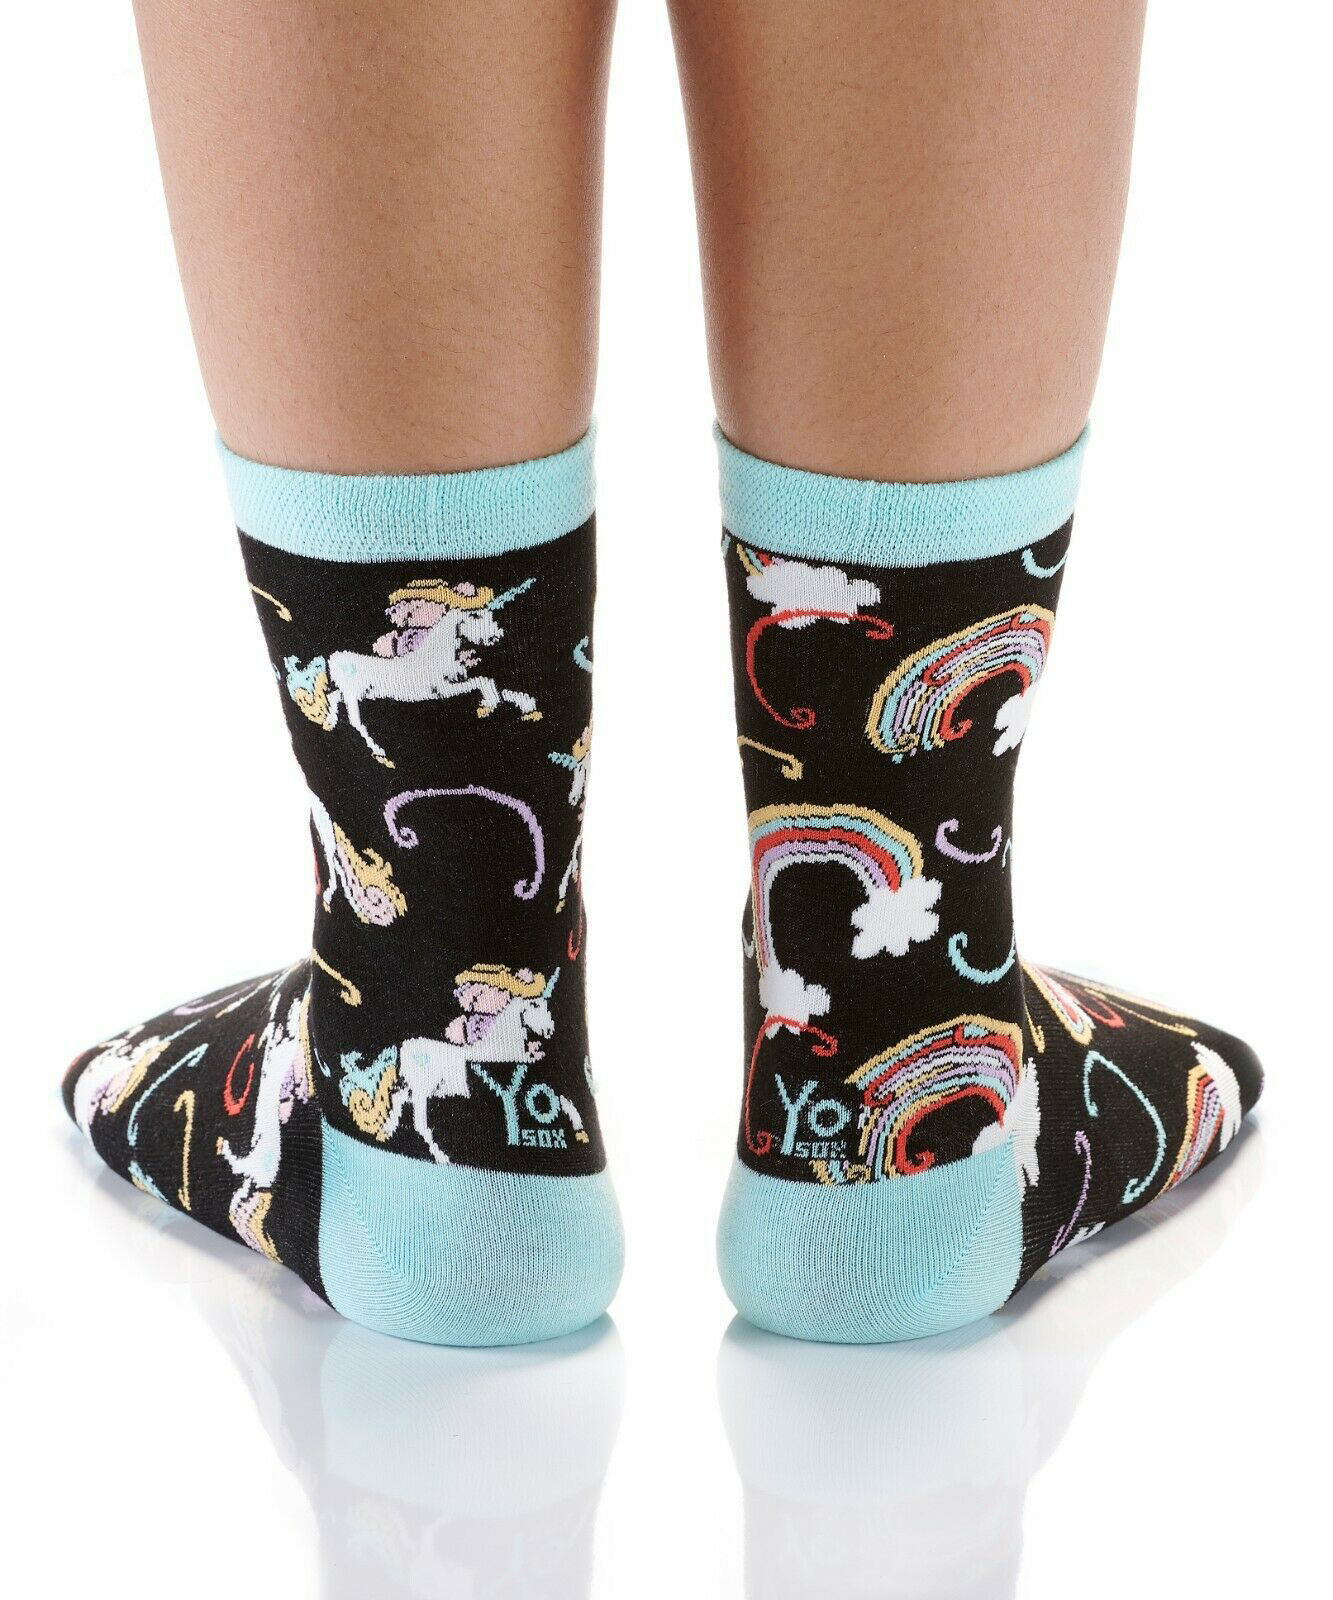 Rainbows & Unicorns Women's Crew Socks by Yo Sox